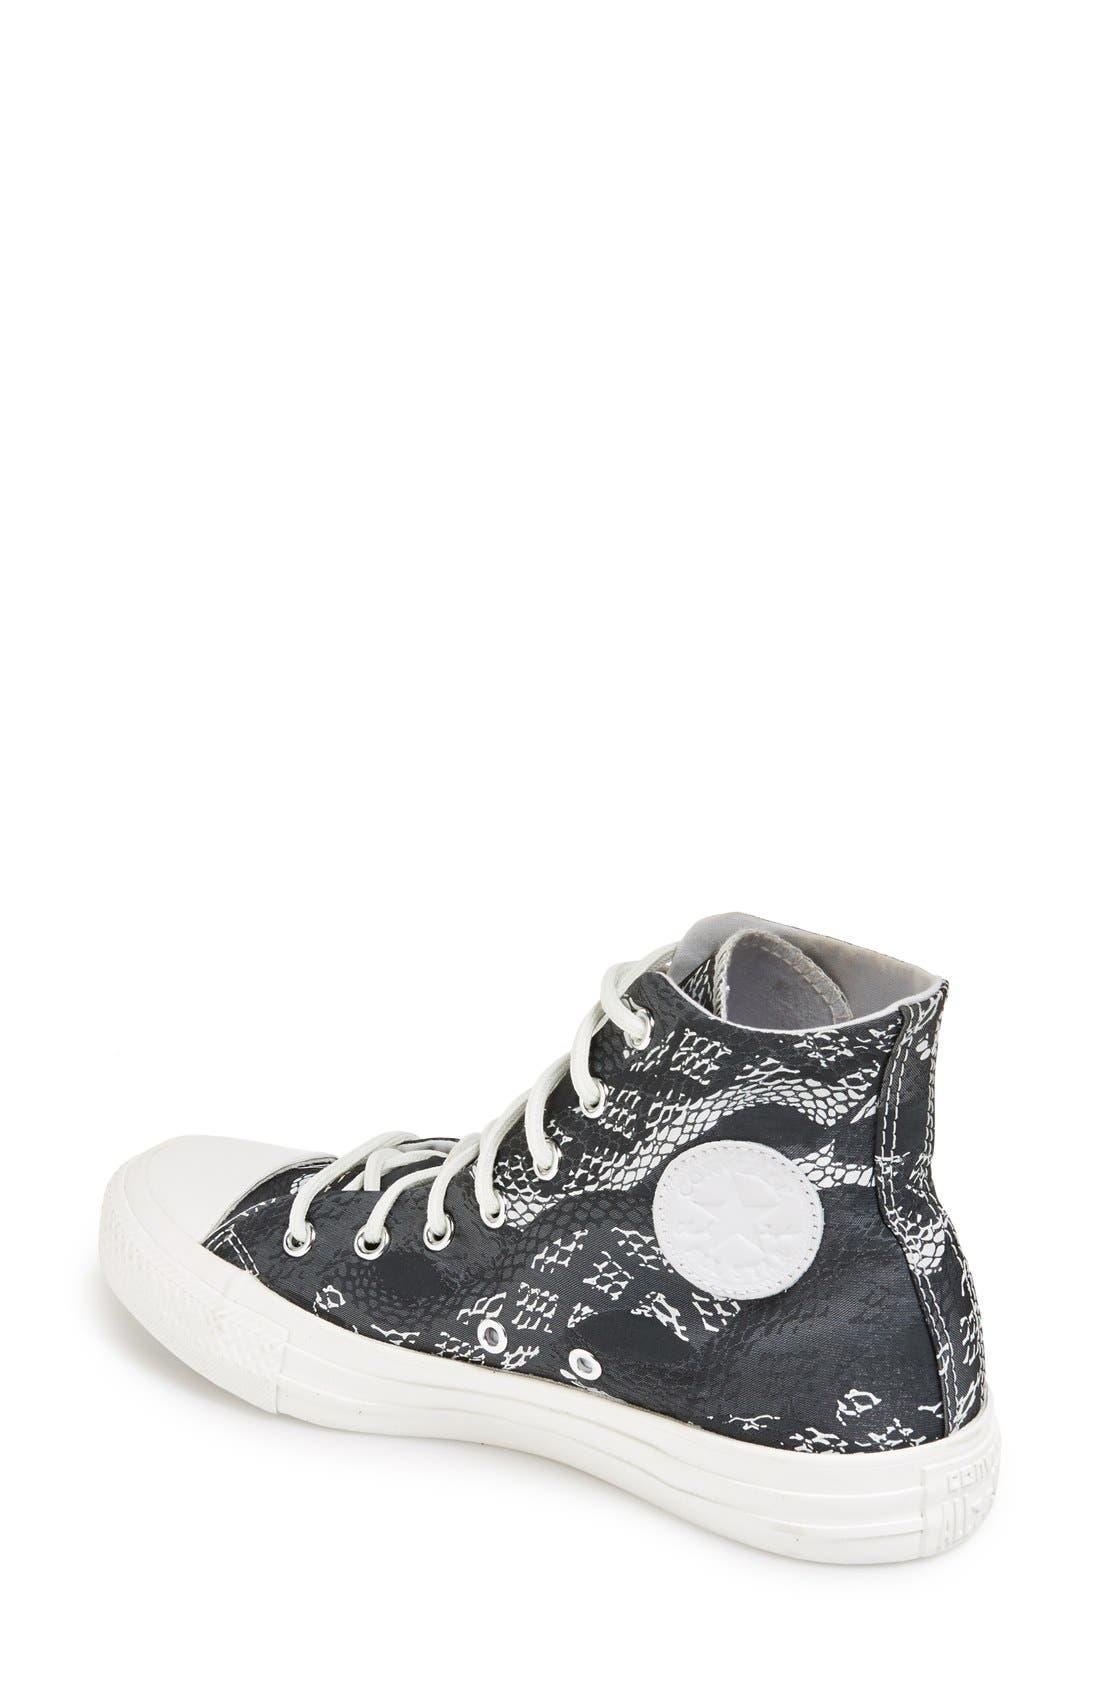 Alternate Image 2  - Converse Chuck Taylor® 'Reptile Print' High Top Sneaker (Women)